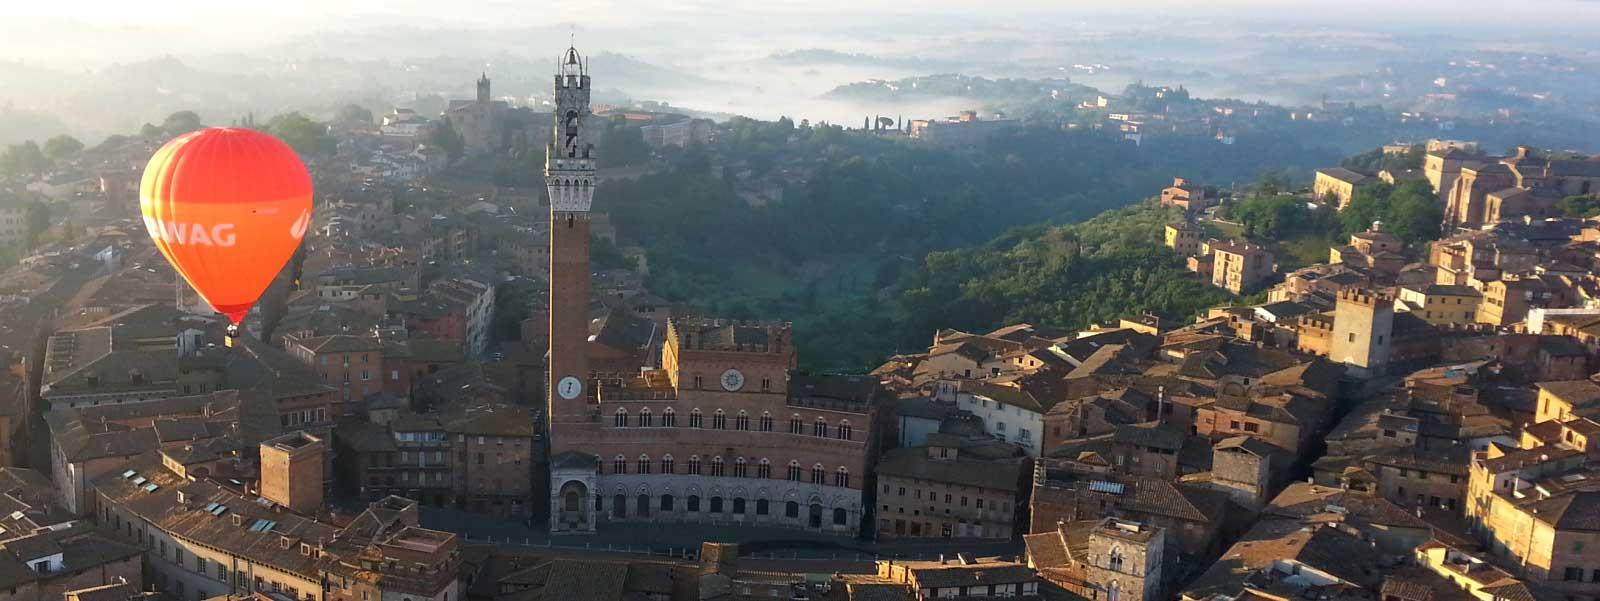 Italian Florence: TUSCANY BALLOONING, Hot Air Balloon Flights In Tuscany